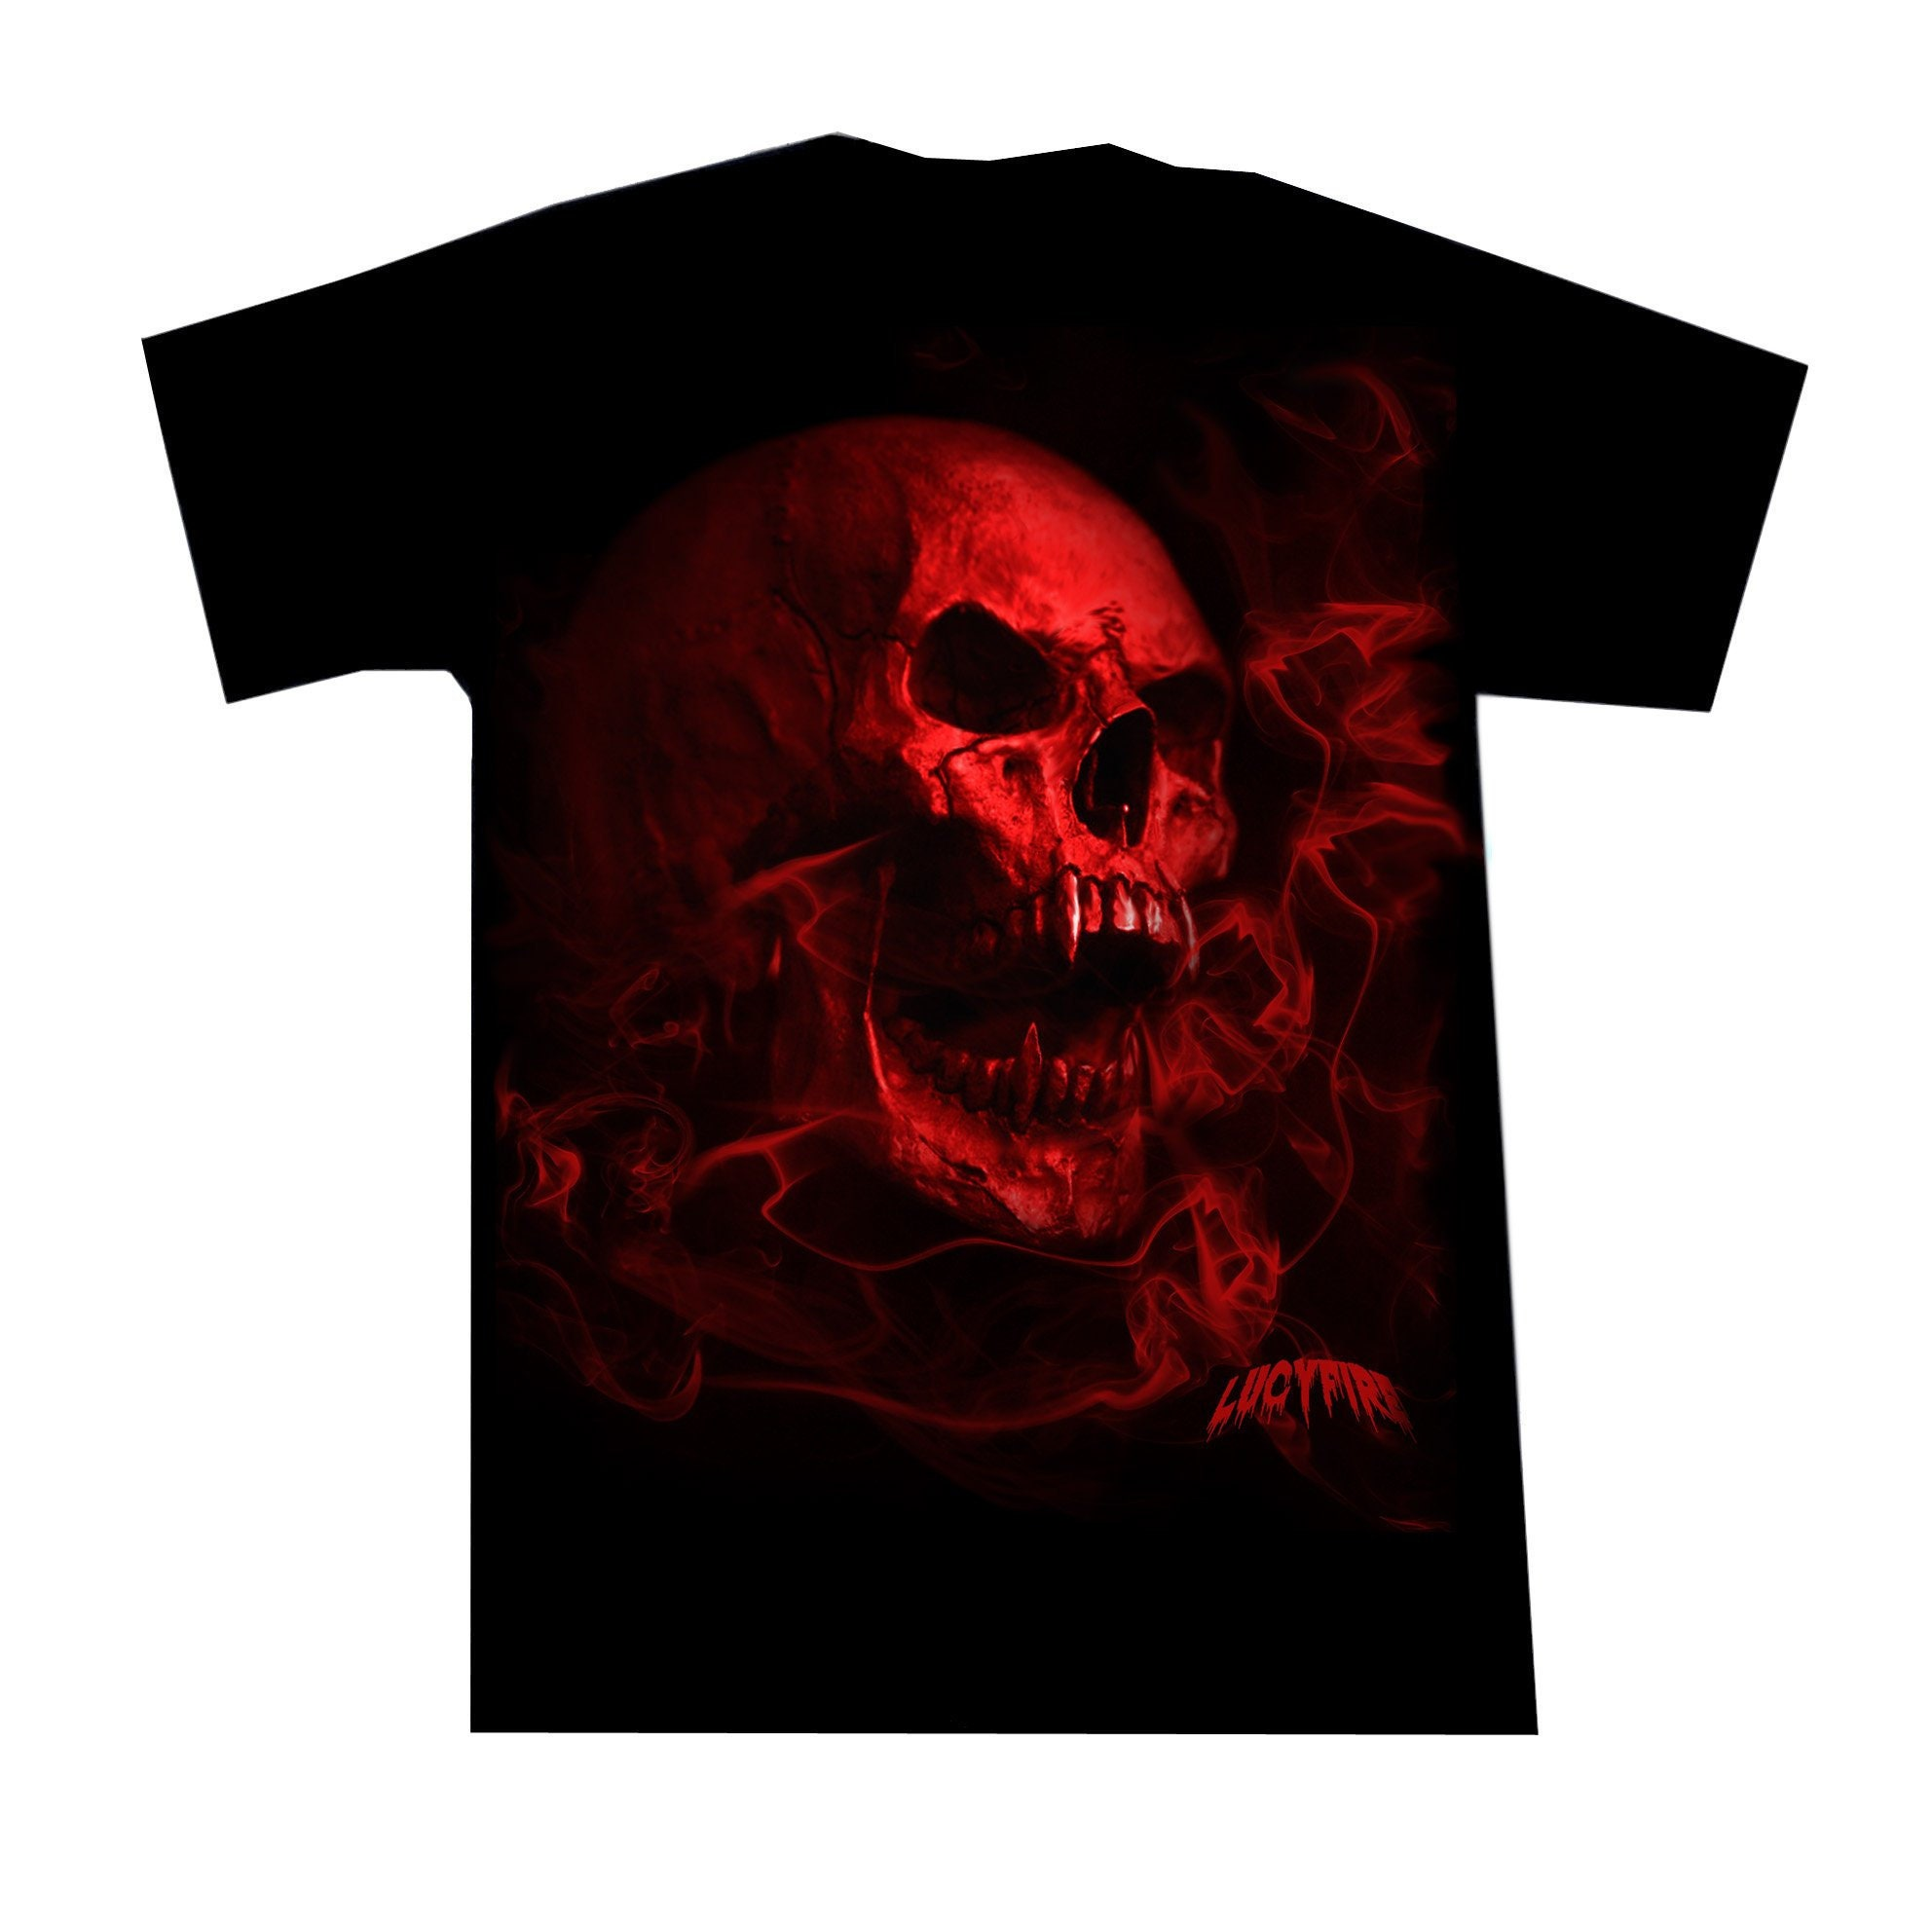 e58326077d870 Heavy Metal T Shirt Smoky Red Vamp Skull